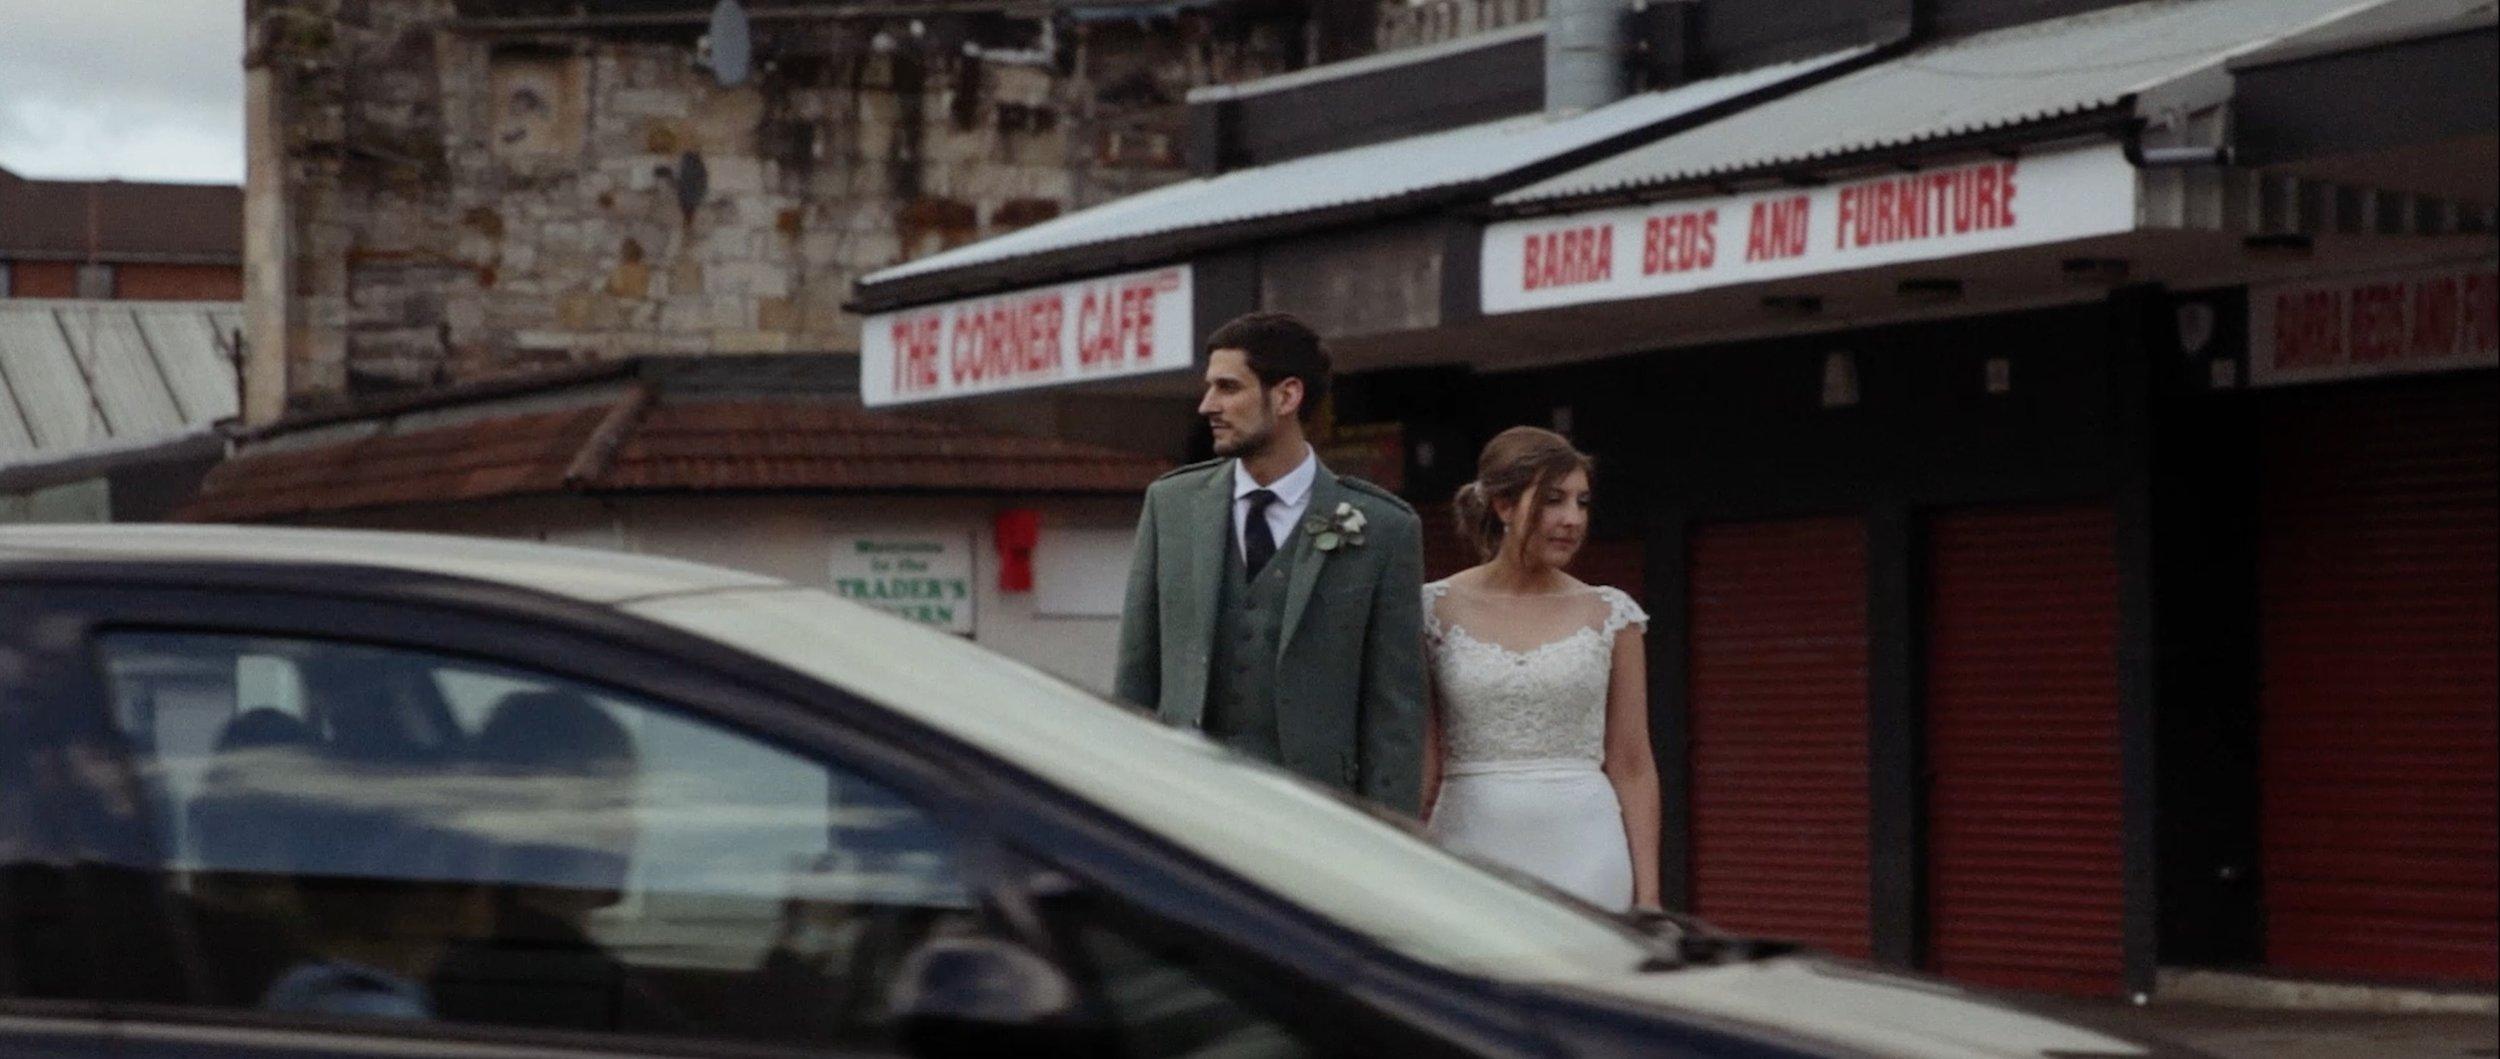 drygate-wedding-videographer_LL_05.jpg